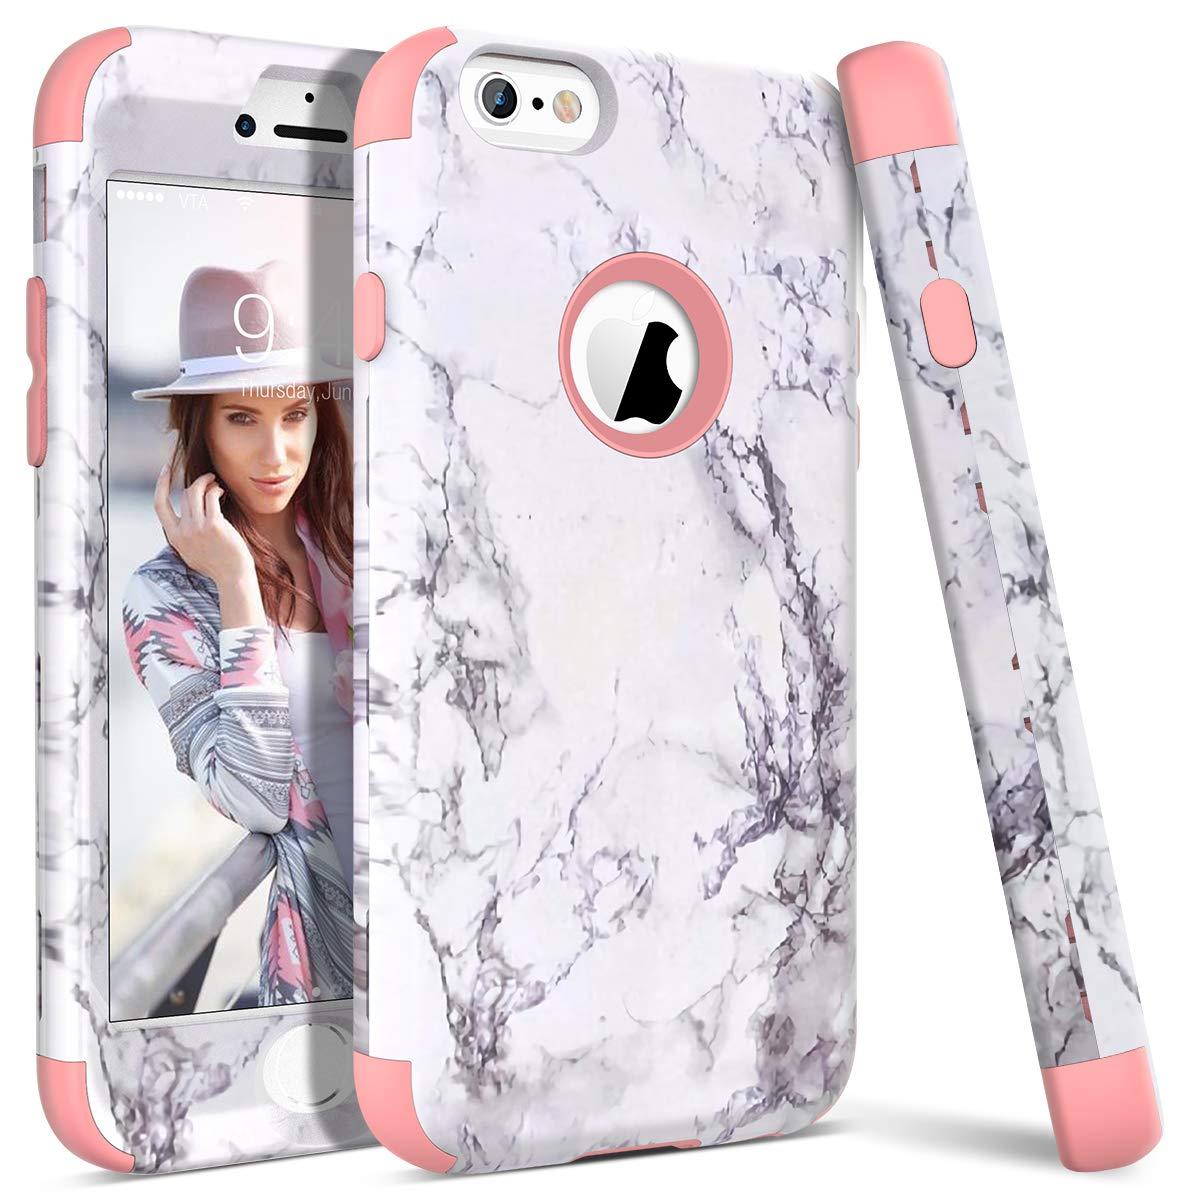 6s plus cases amazon co ukwe love case for iphone 6 plus case iphone 6s plus case marble shockproof 360 degree